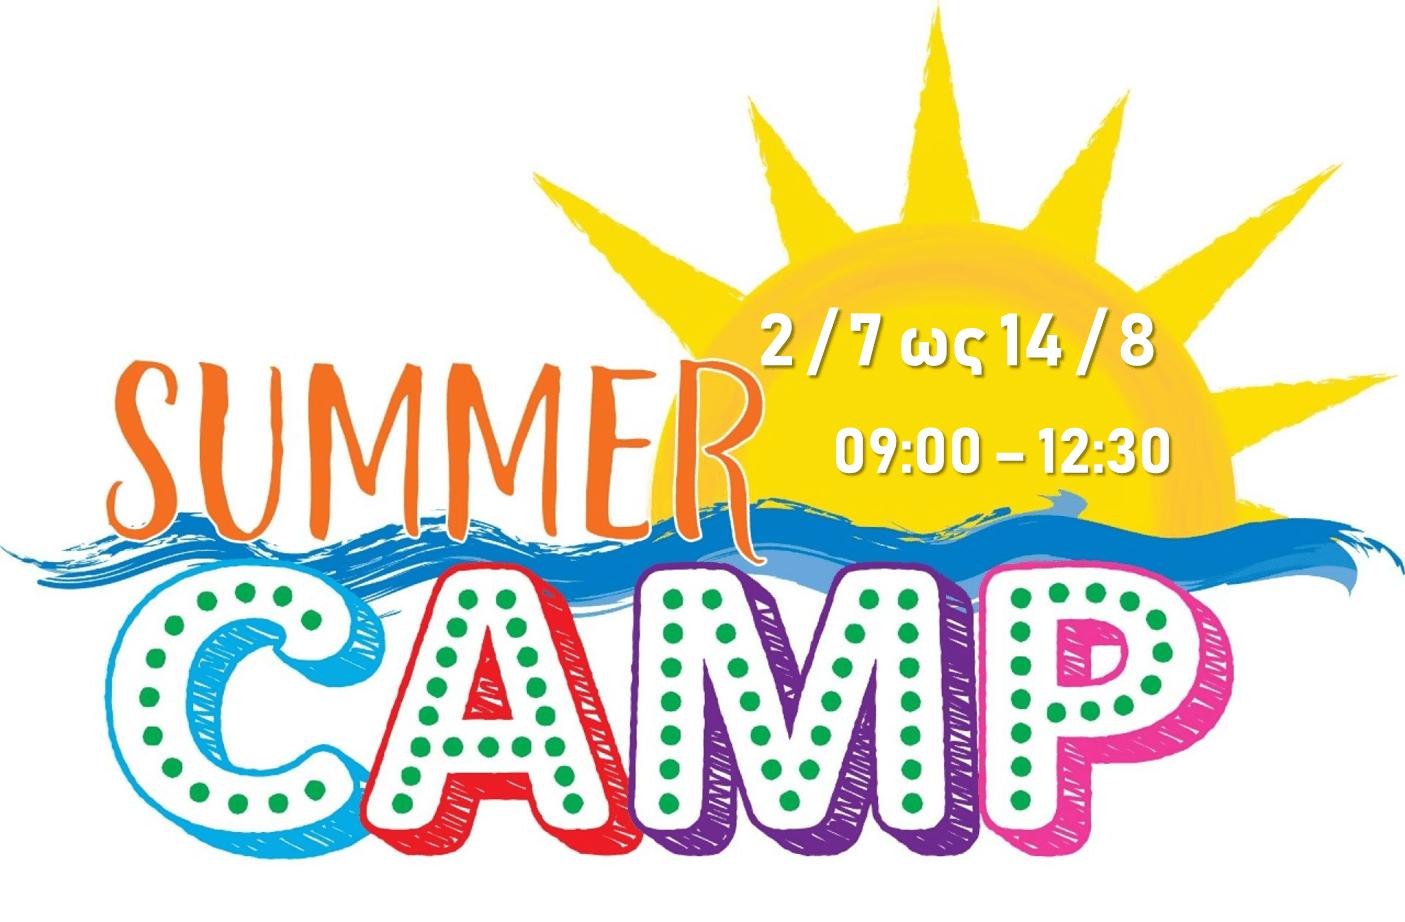 Summer Camp στο Κοινωνικό Κέντρο της Κάριτας Ελλάς στην Πλατεία Βάθης